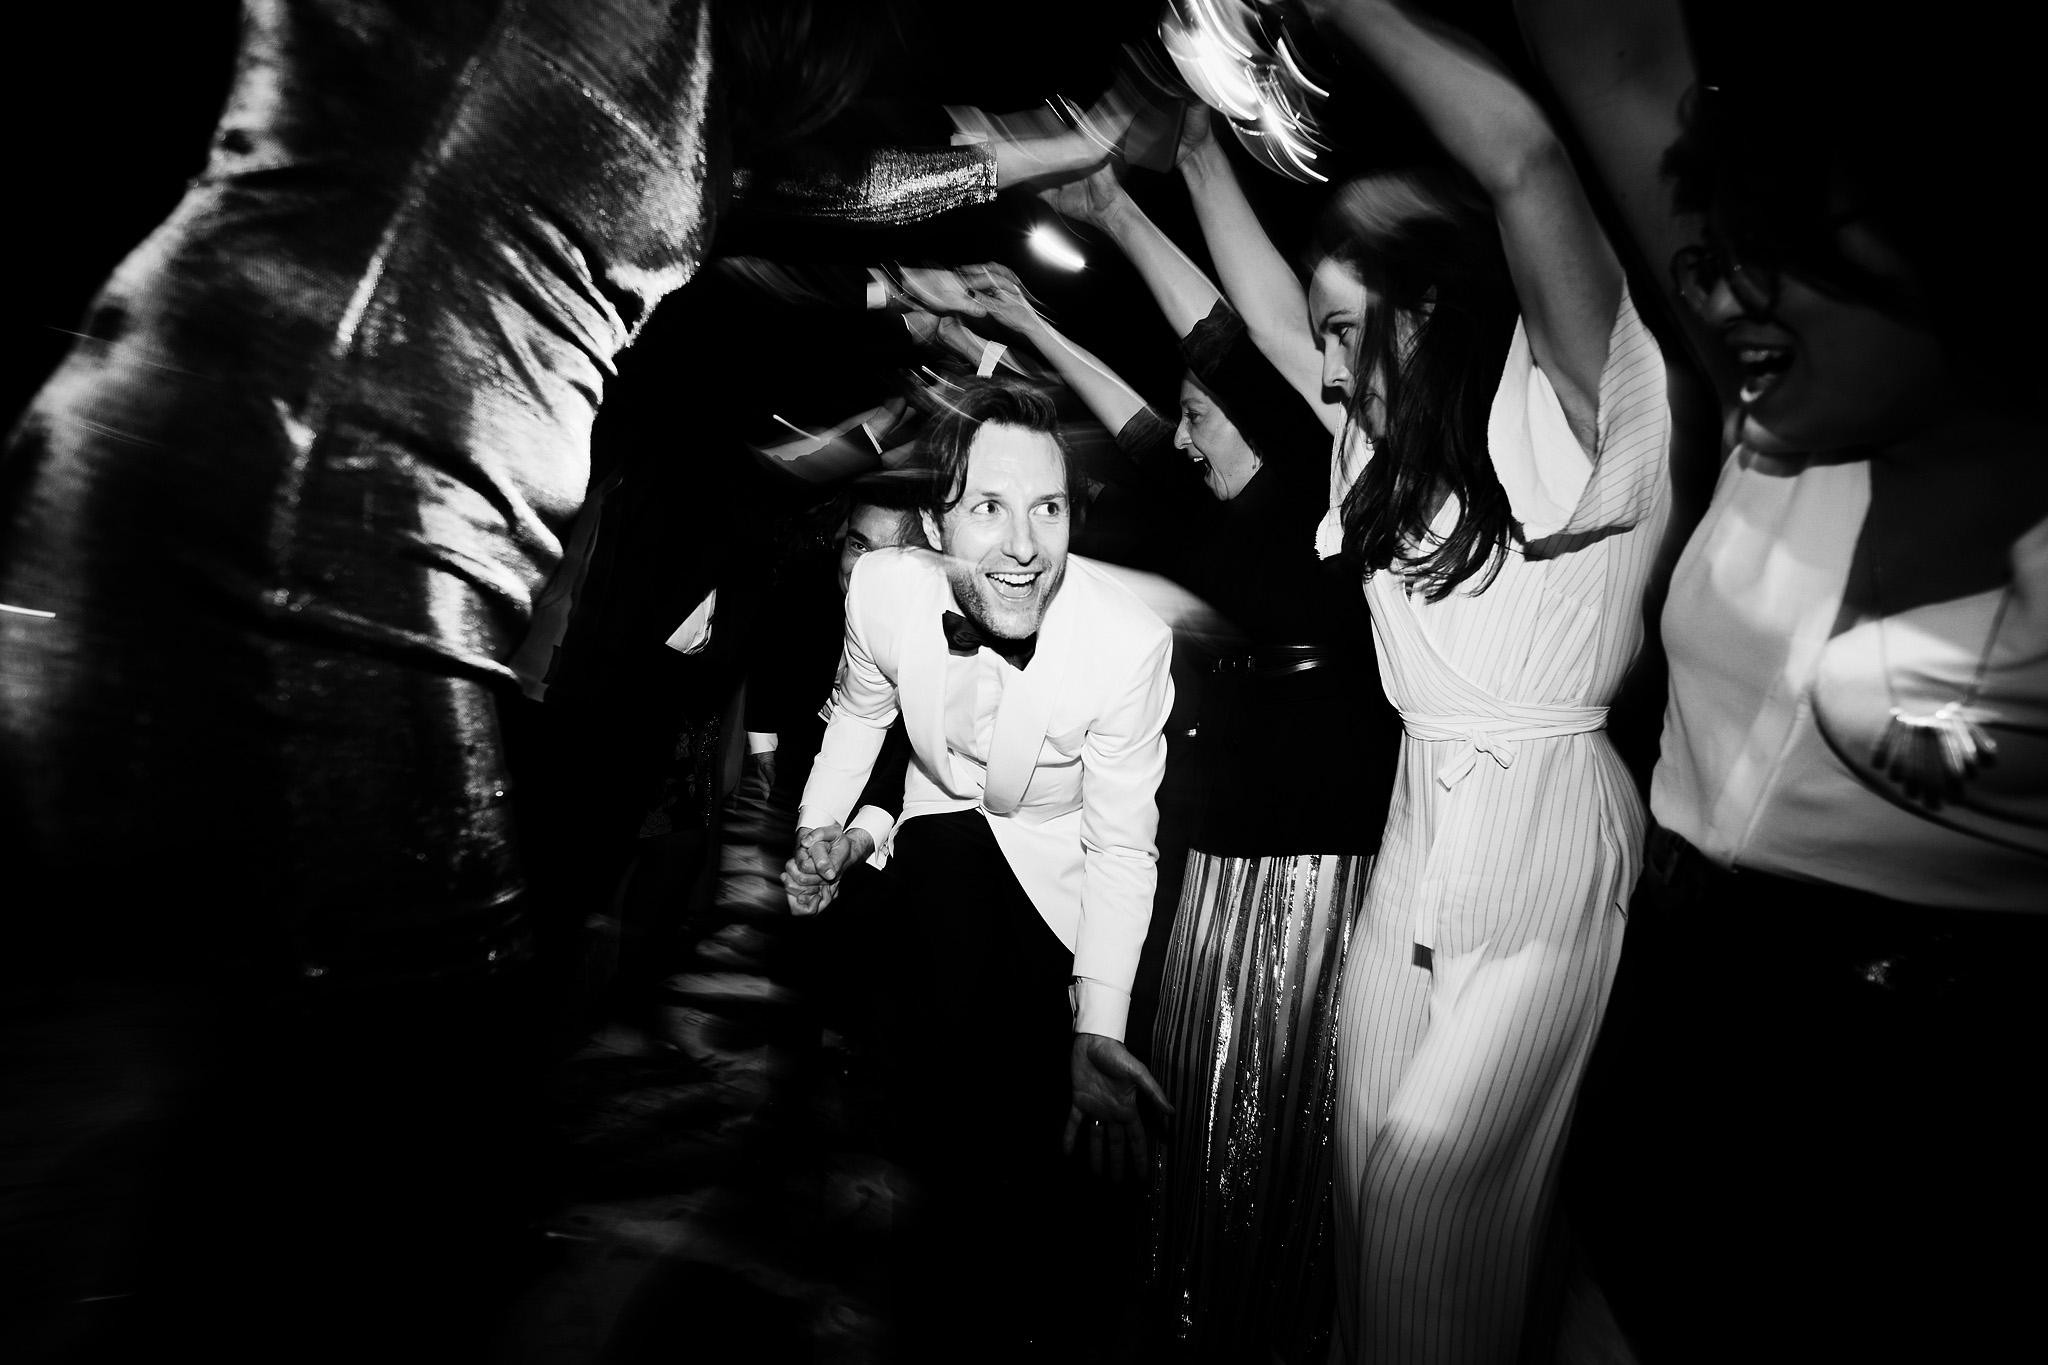 Plaza Ballroom Wedding on Mr Theodore. Photography by Eric Ronald